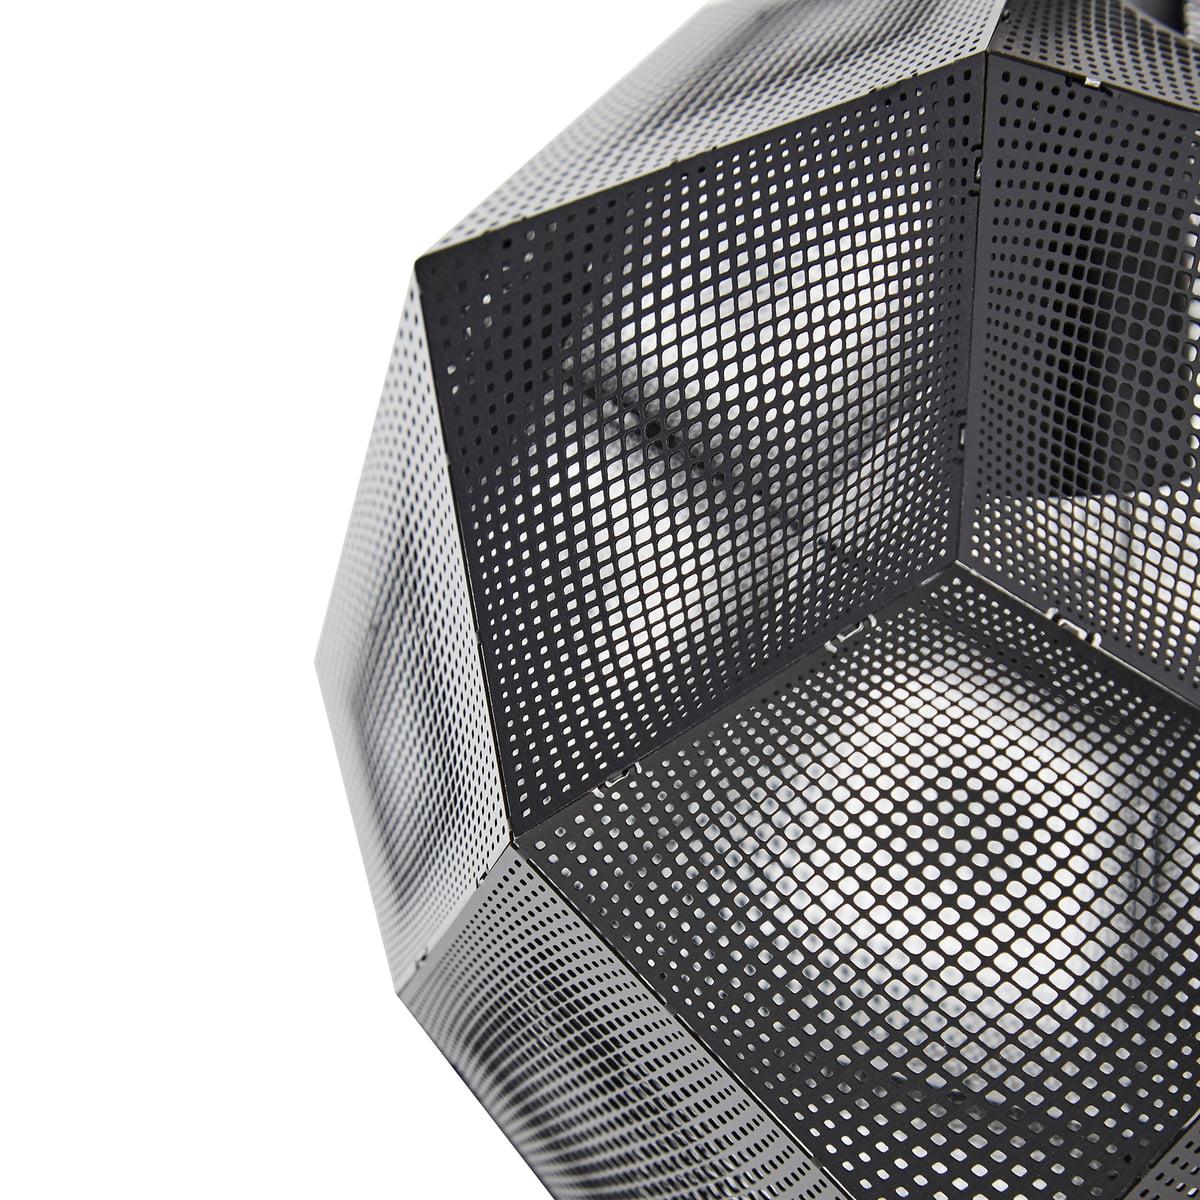 etch mini pendant lamp by tom dixon. Black Bedroom Furniture Sets. Home Design Ideas